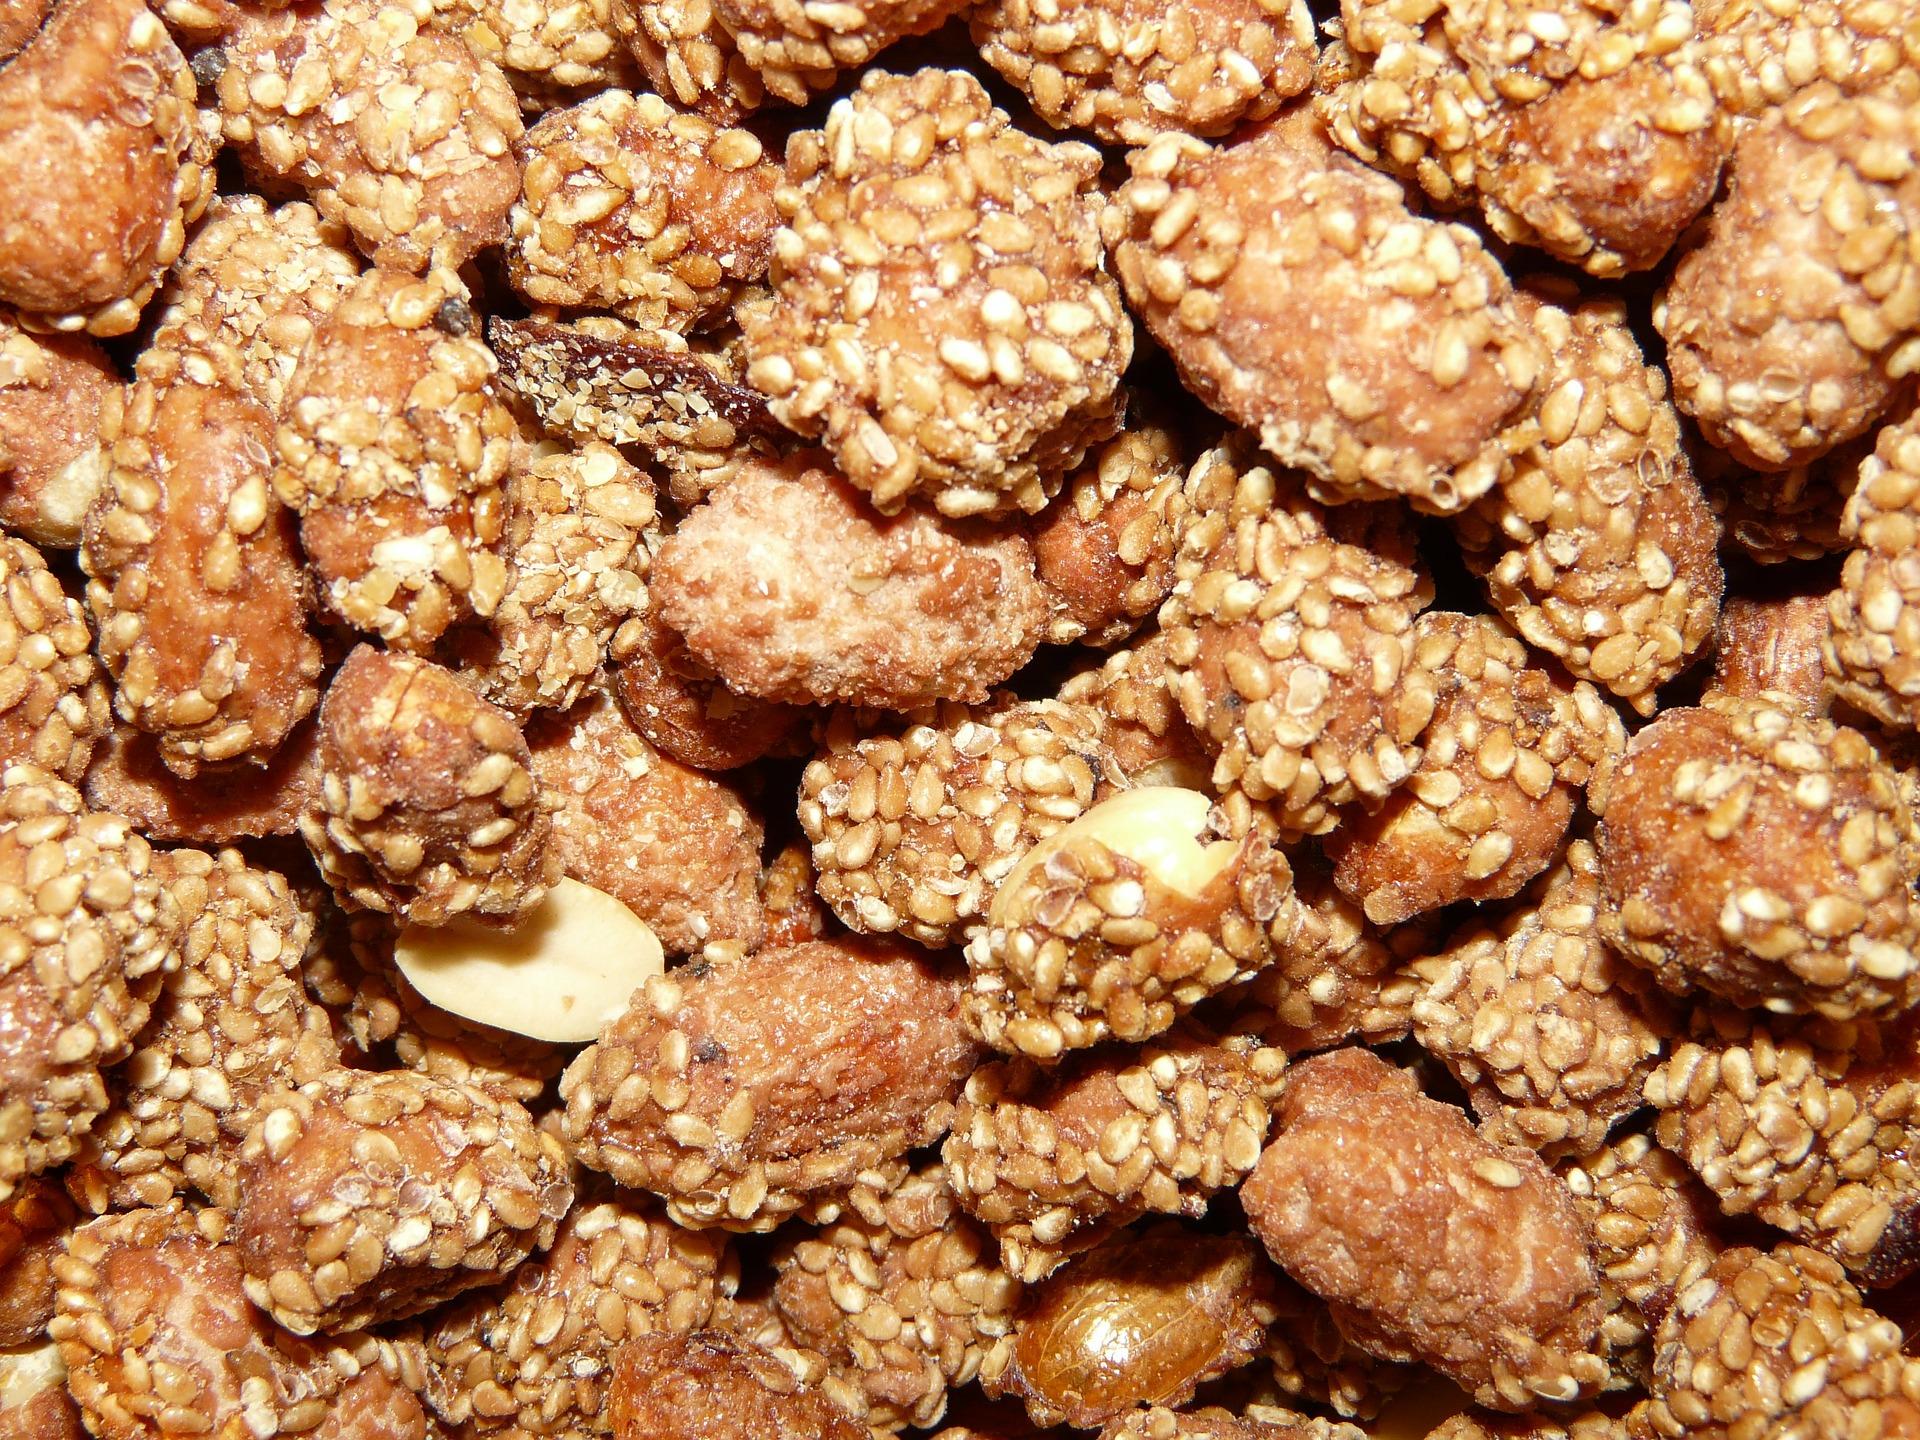 nuts-11338_1920 pixabay.jpg